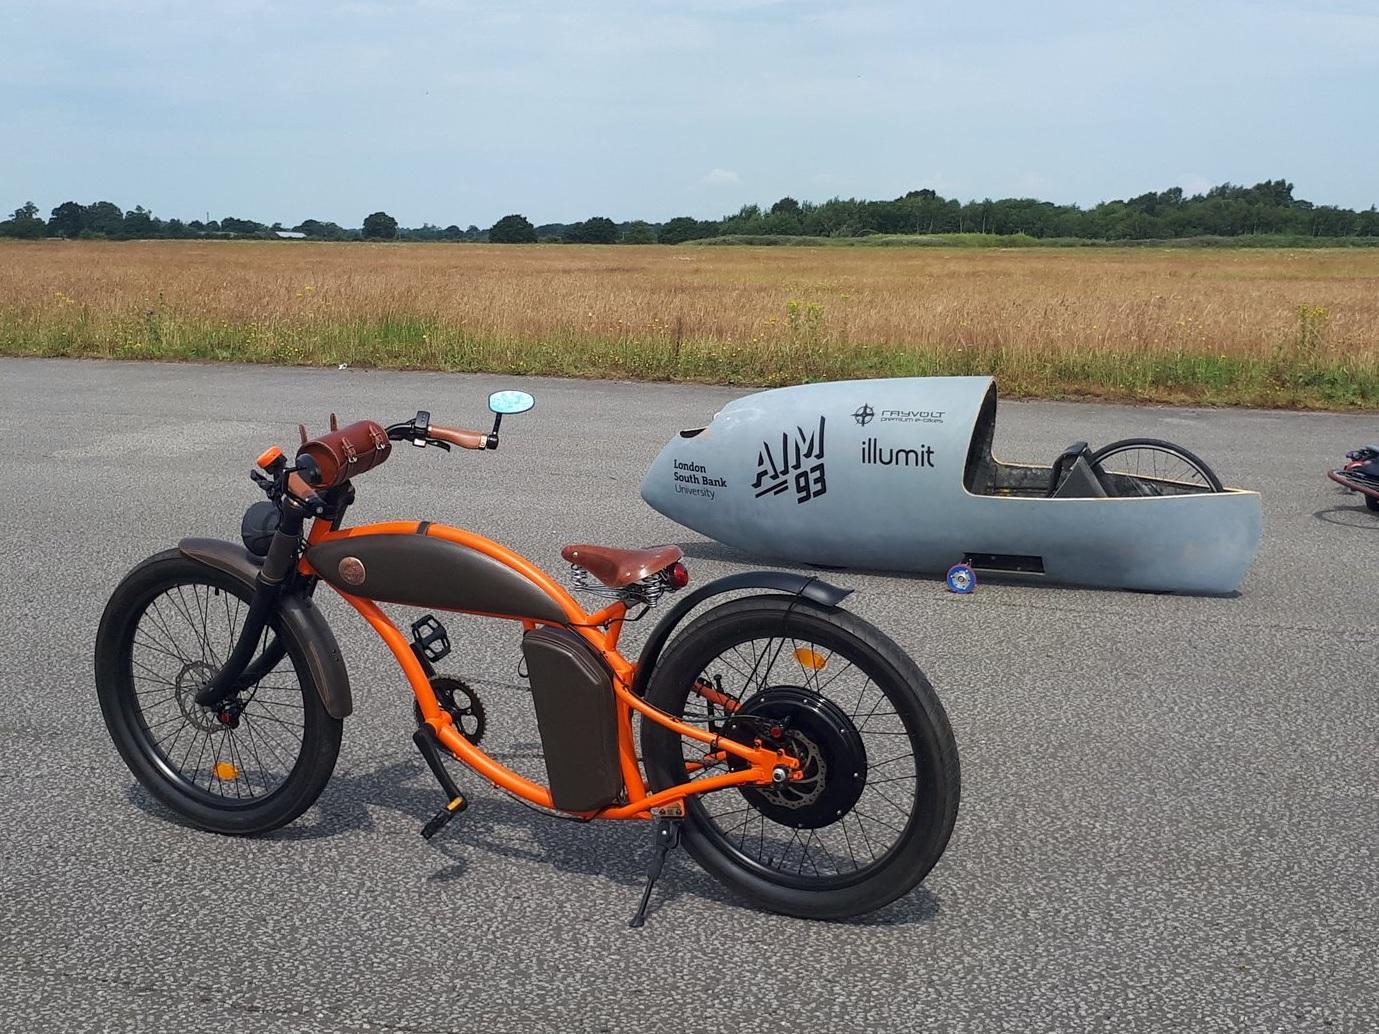 Rayvolt Premium E- Bike along side AIm93's Velociraptor